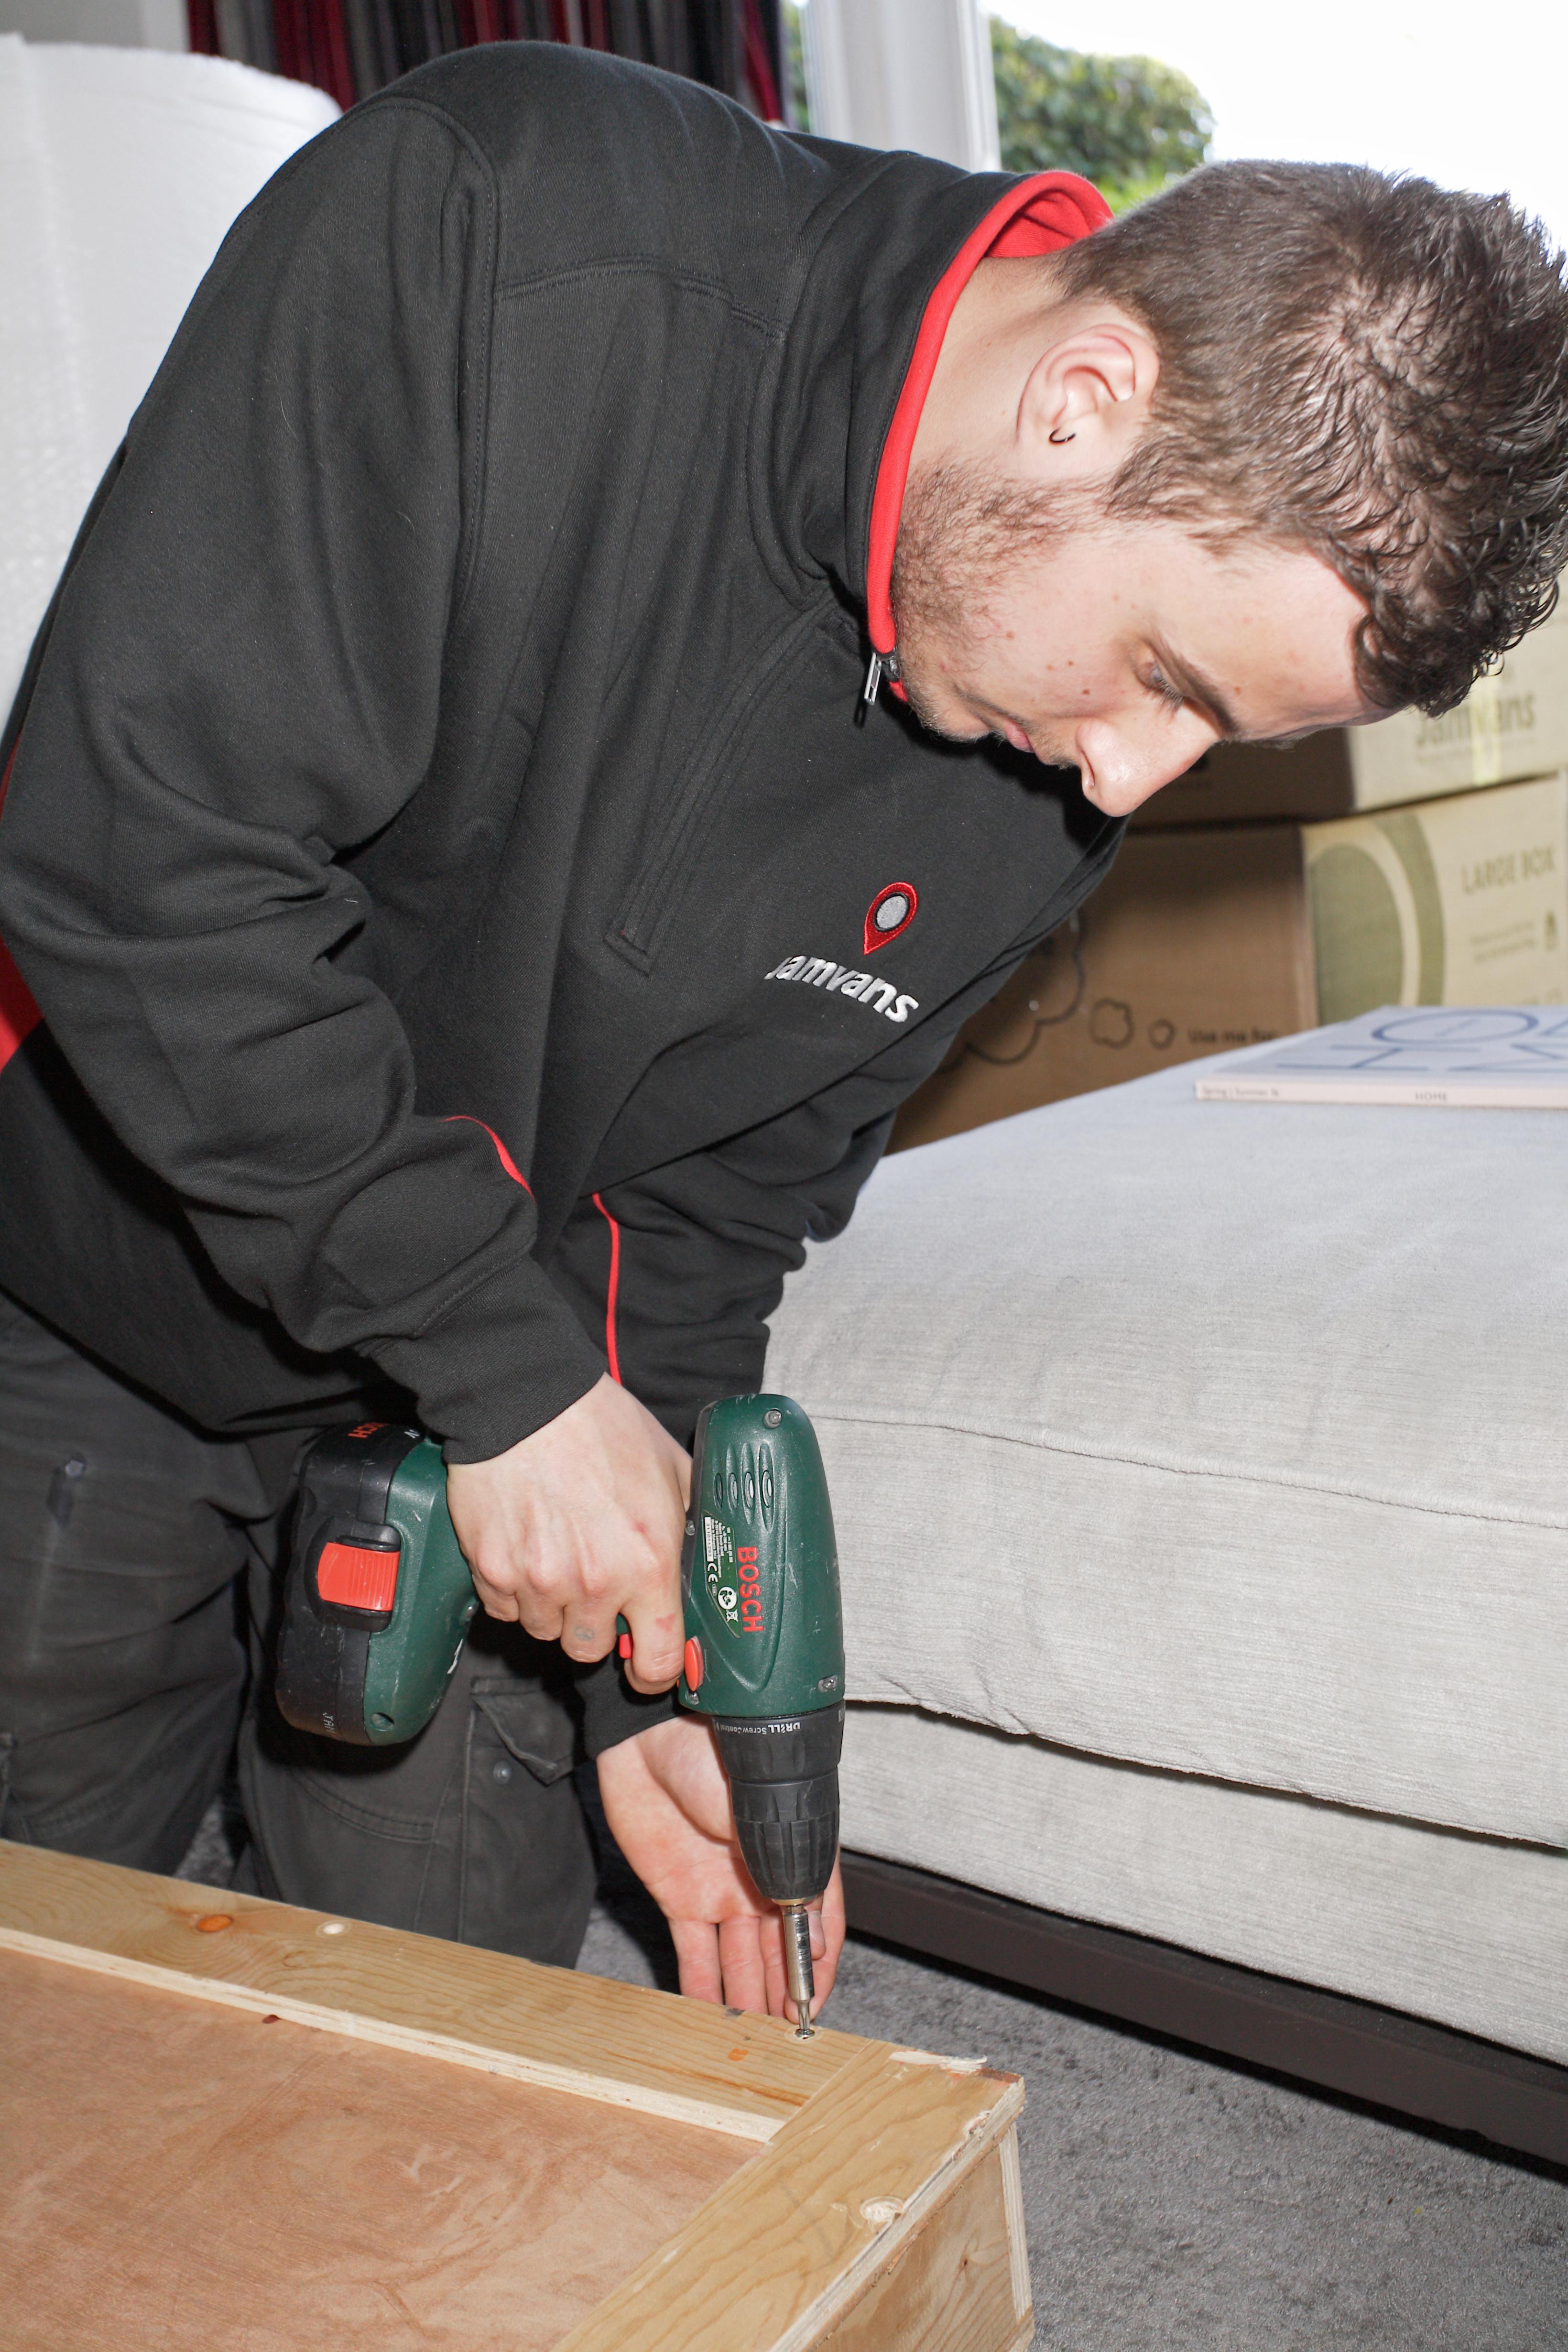 Man drilling furniture